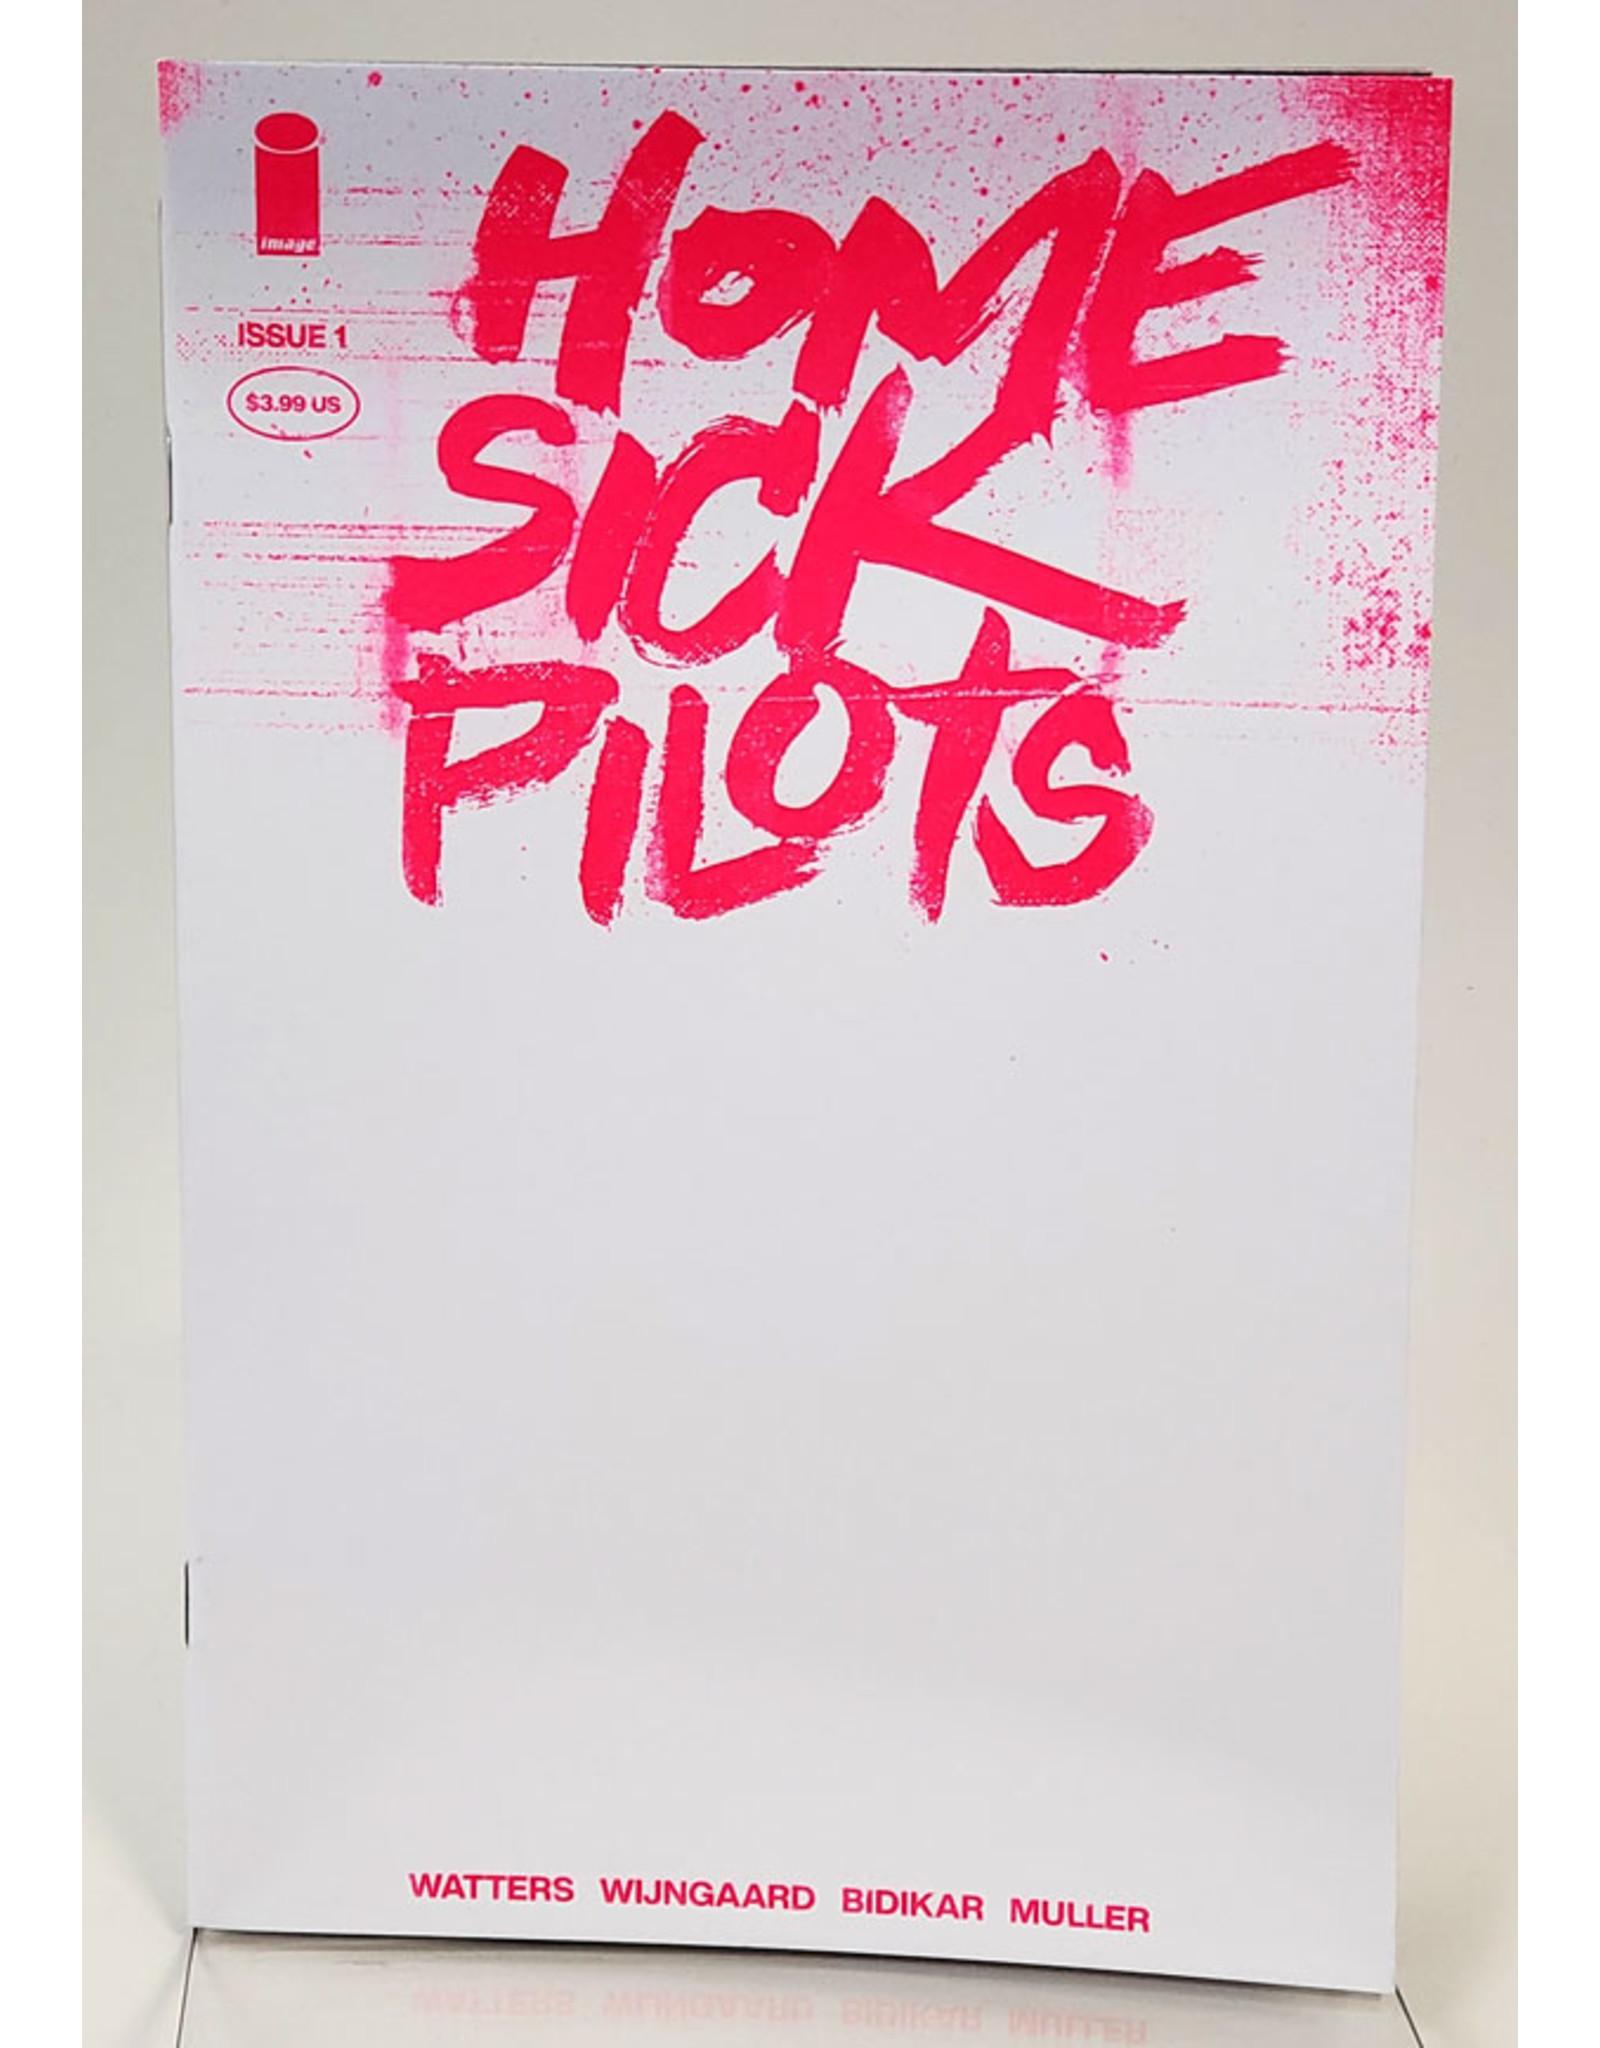 IMAGE COMICS HOME SICK PILOTS #1 1:25 PINK NEON BLANK VAR